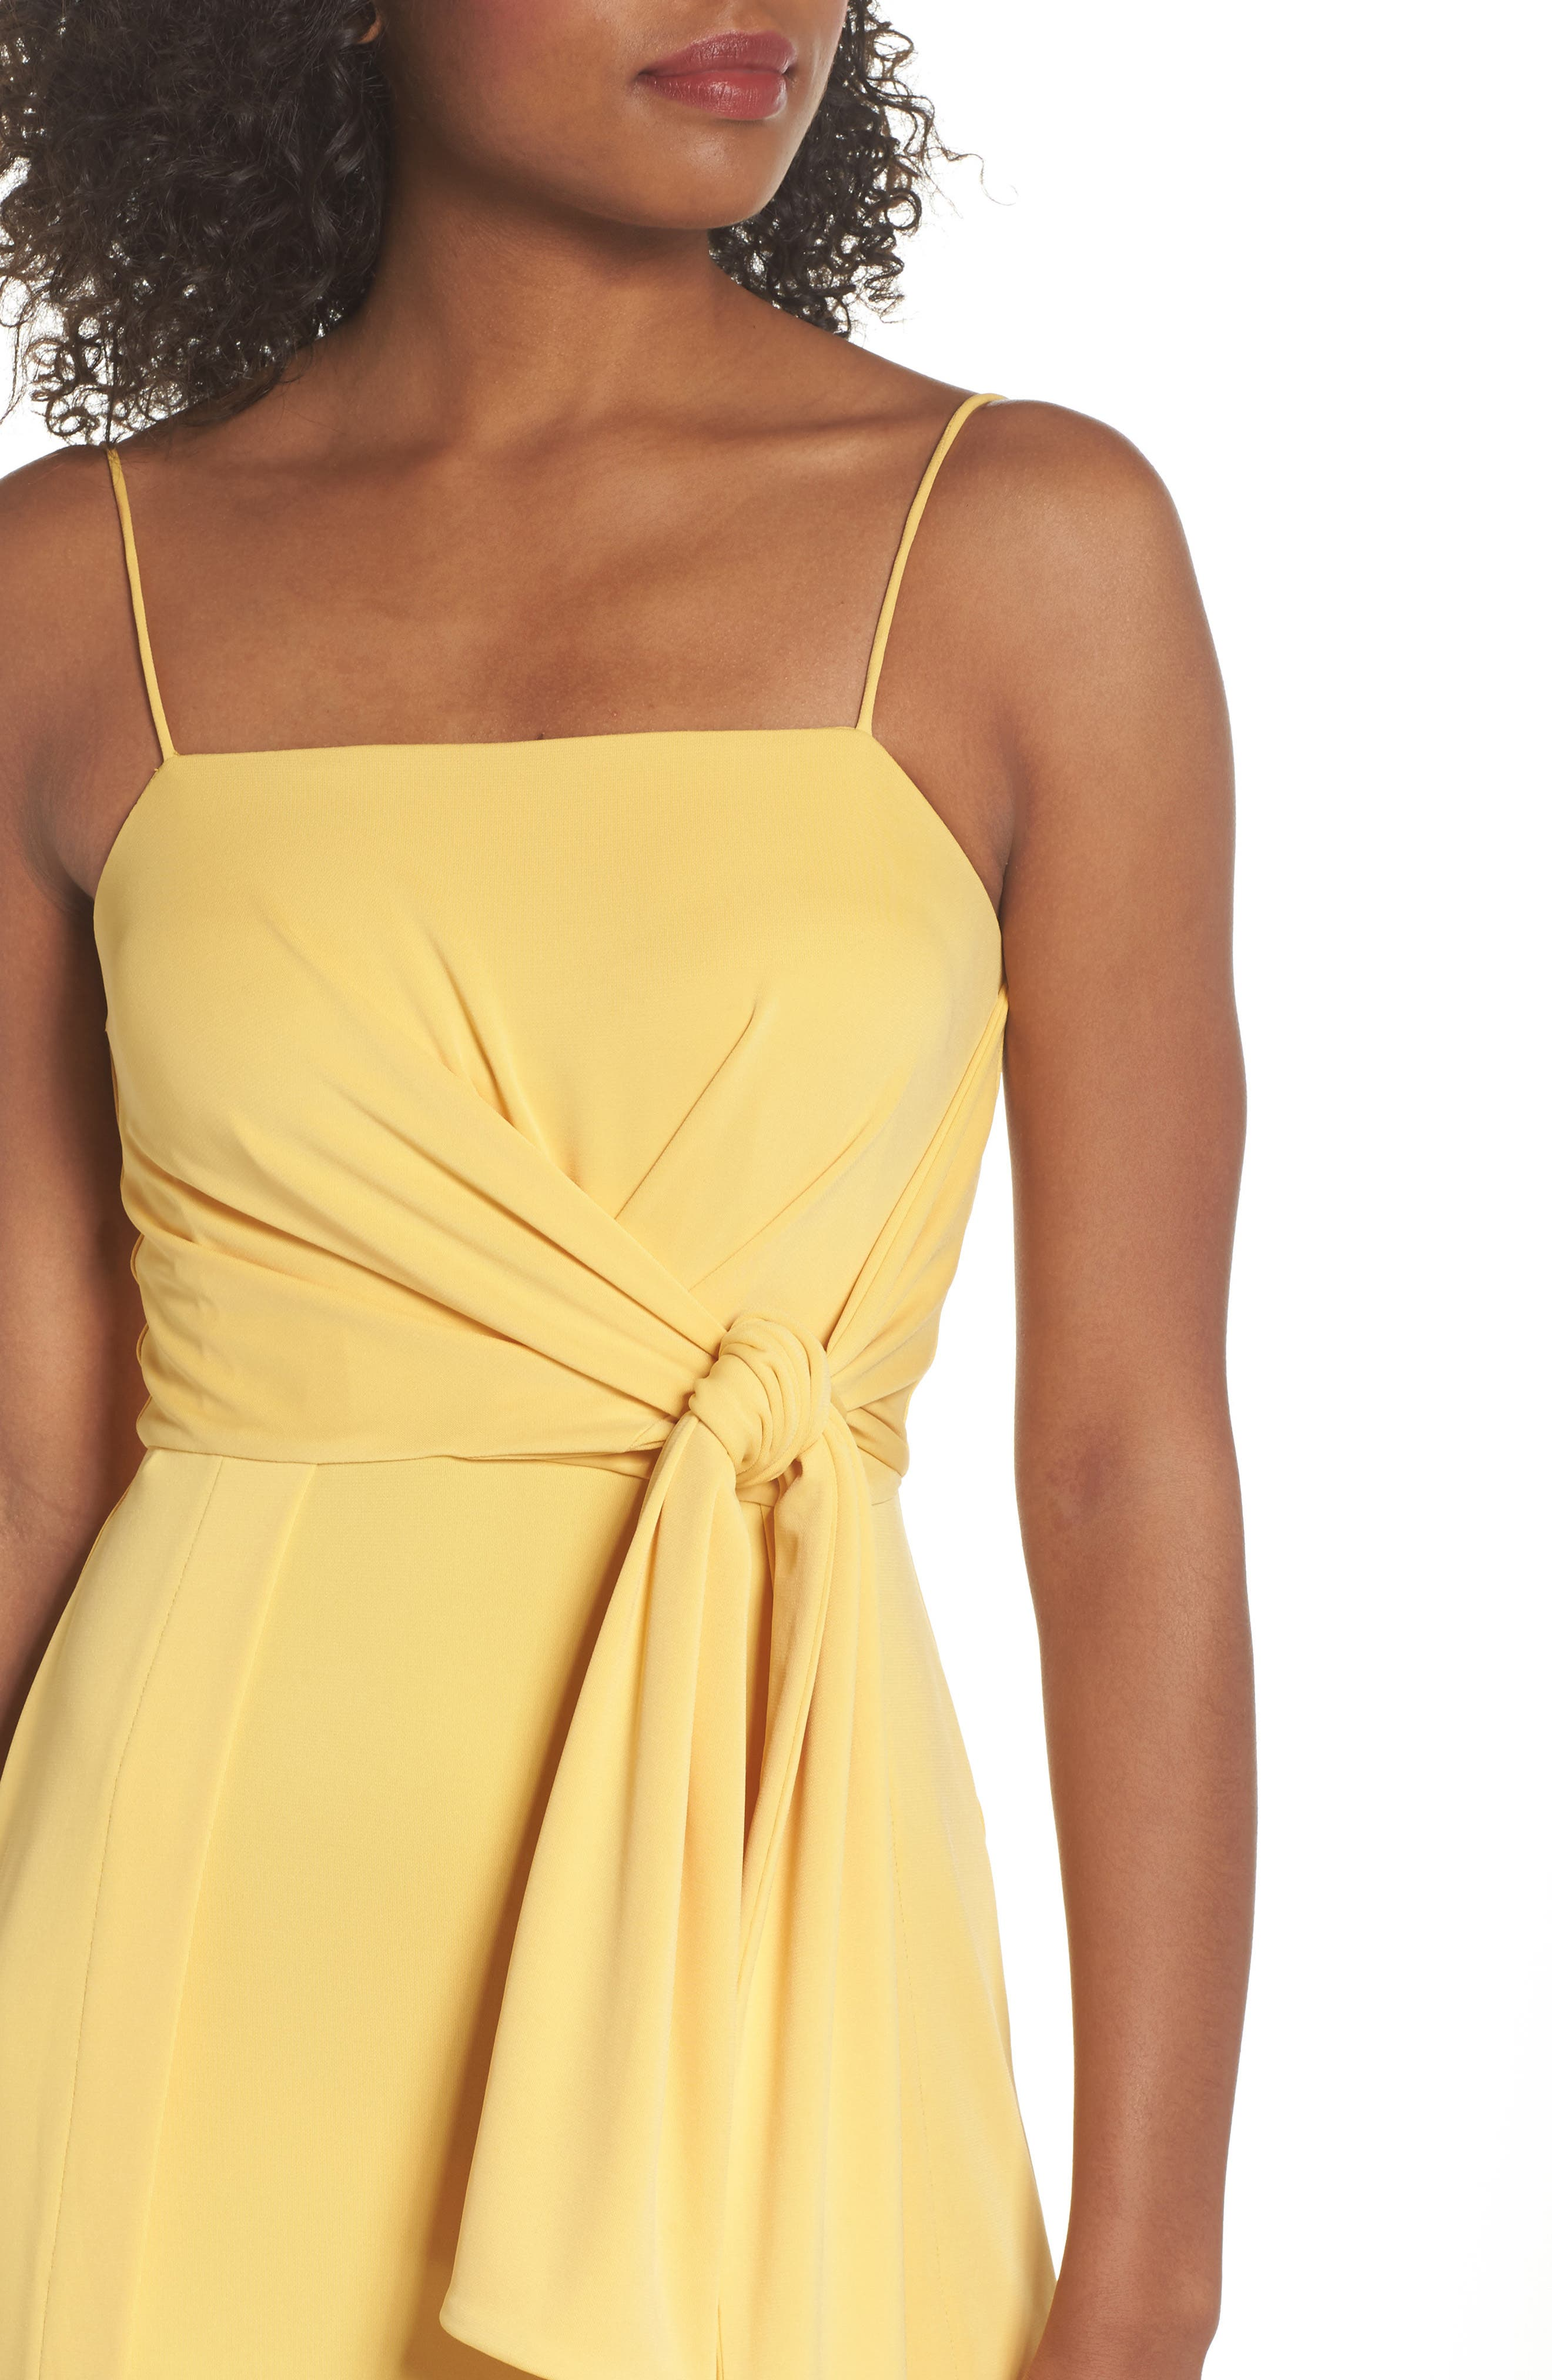 Recollect Slinky Side Tie Midi Dress,                             Alternate thumbnail 4, color,                             Honey